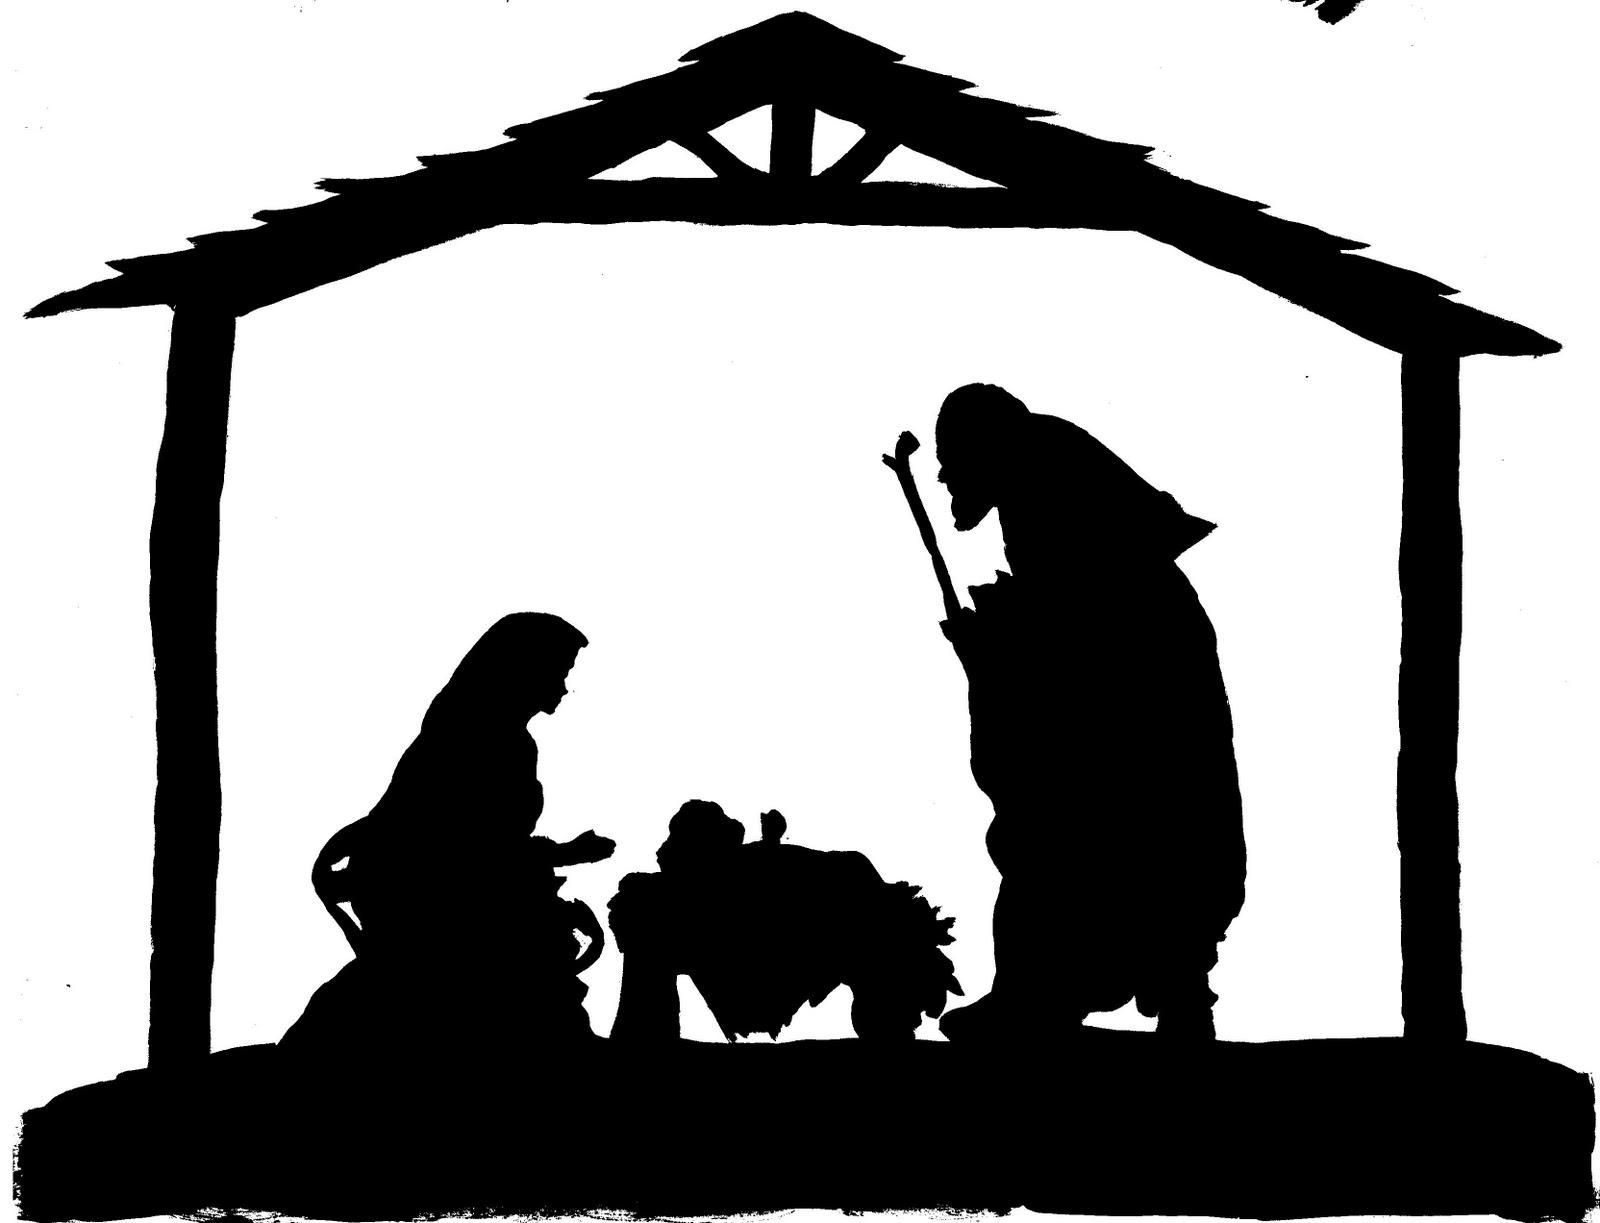 Fall Wallpaper Cartoon Nativity Wallpaper Download Free Nativity Wallpaper And